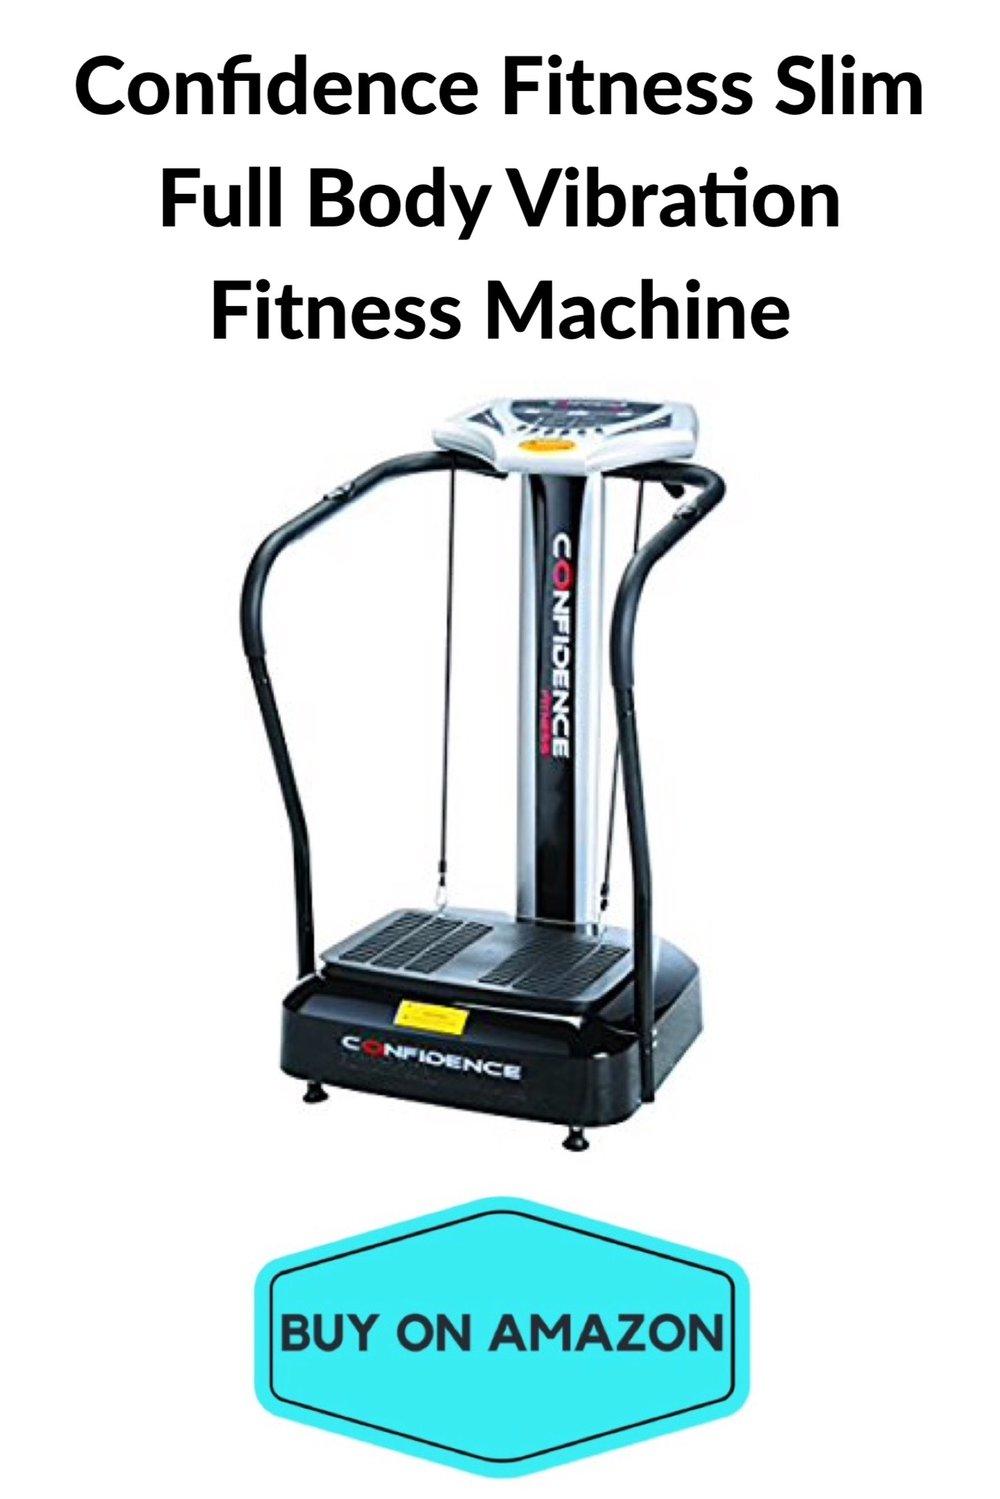 Confidence Fitness Slim Full Body Vibration Fitness Machine